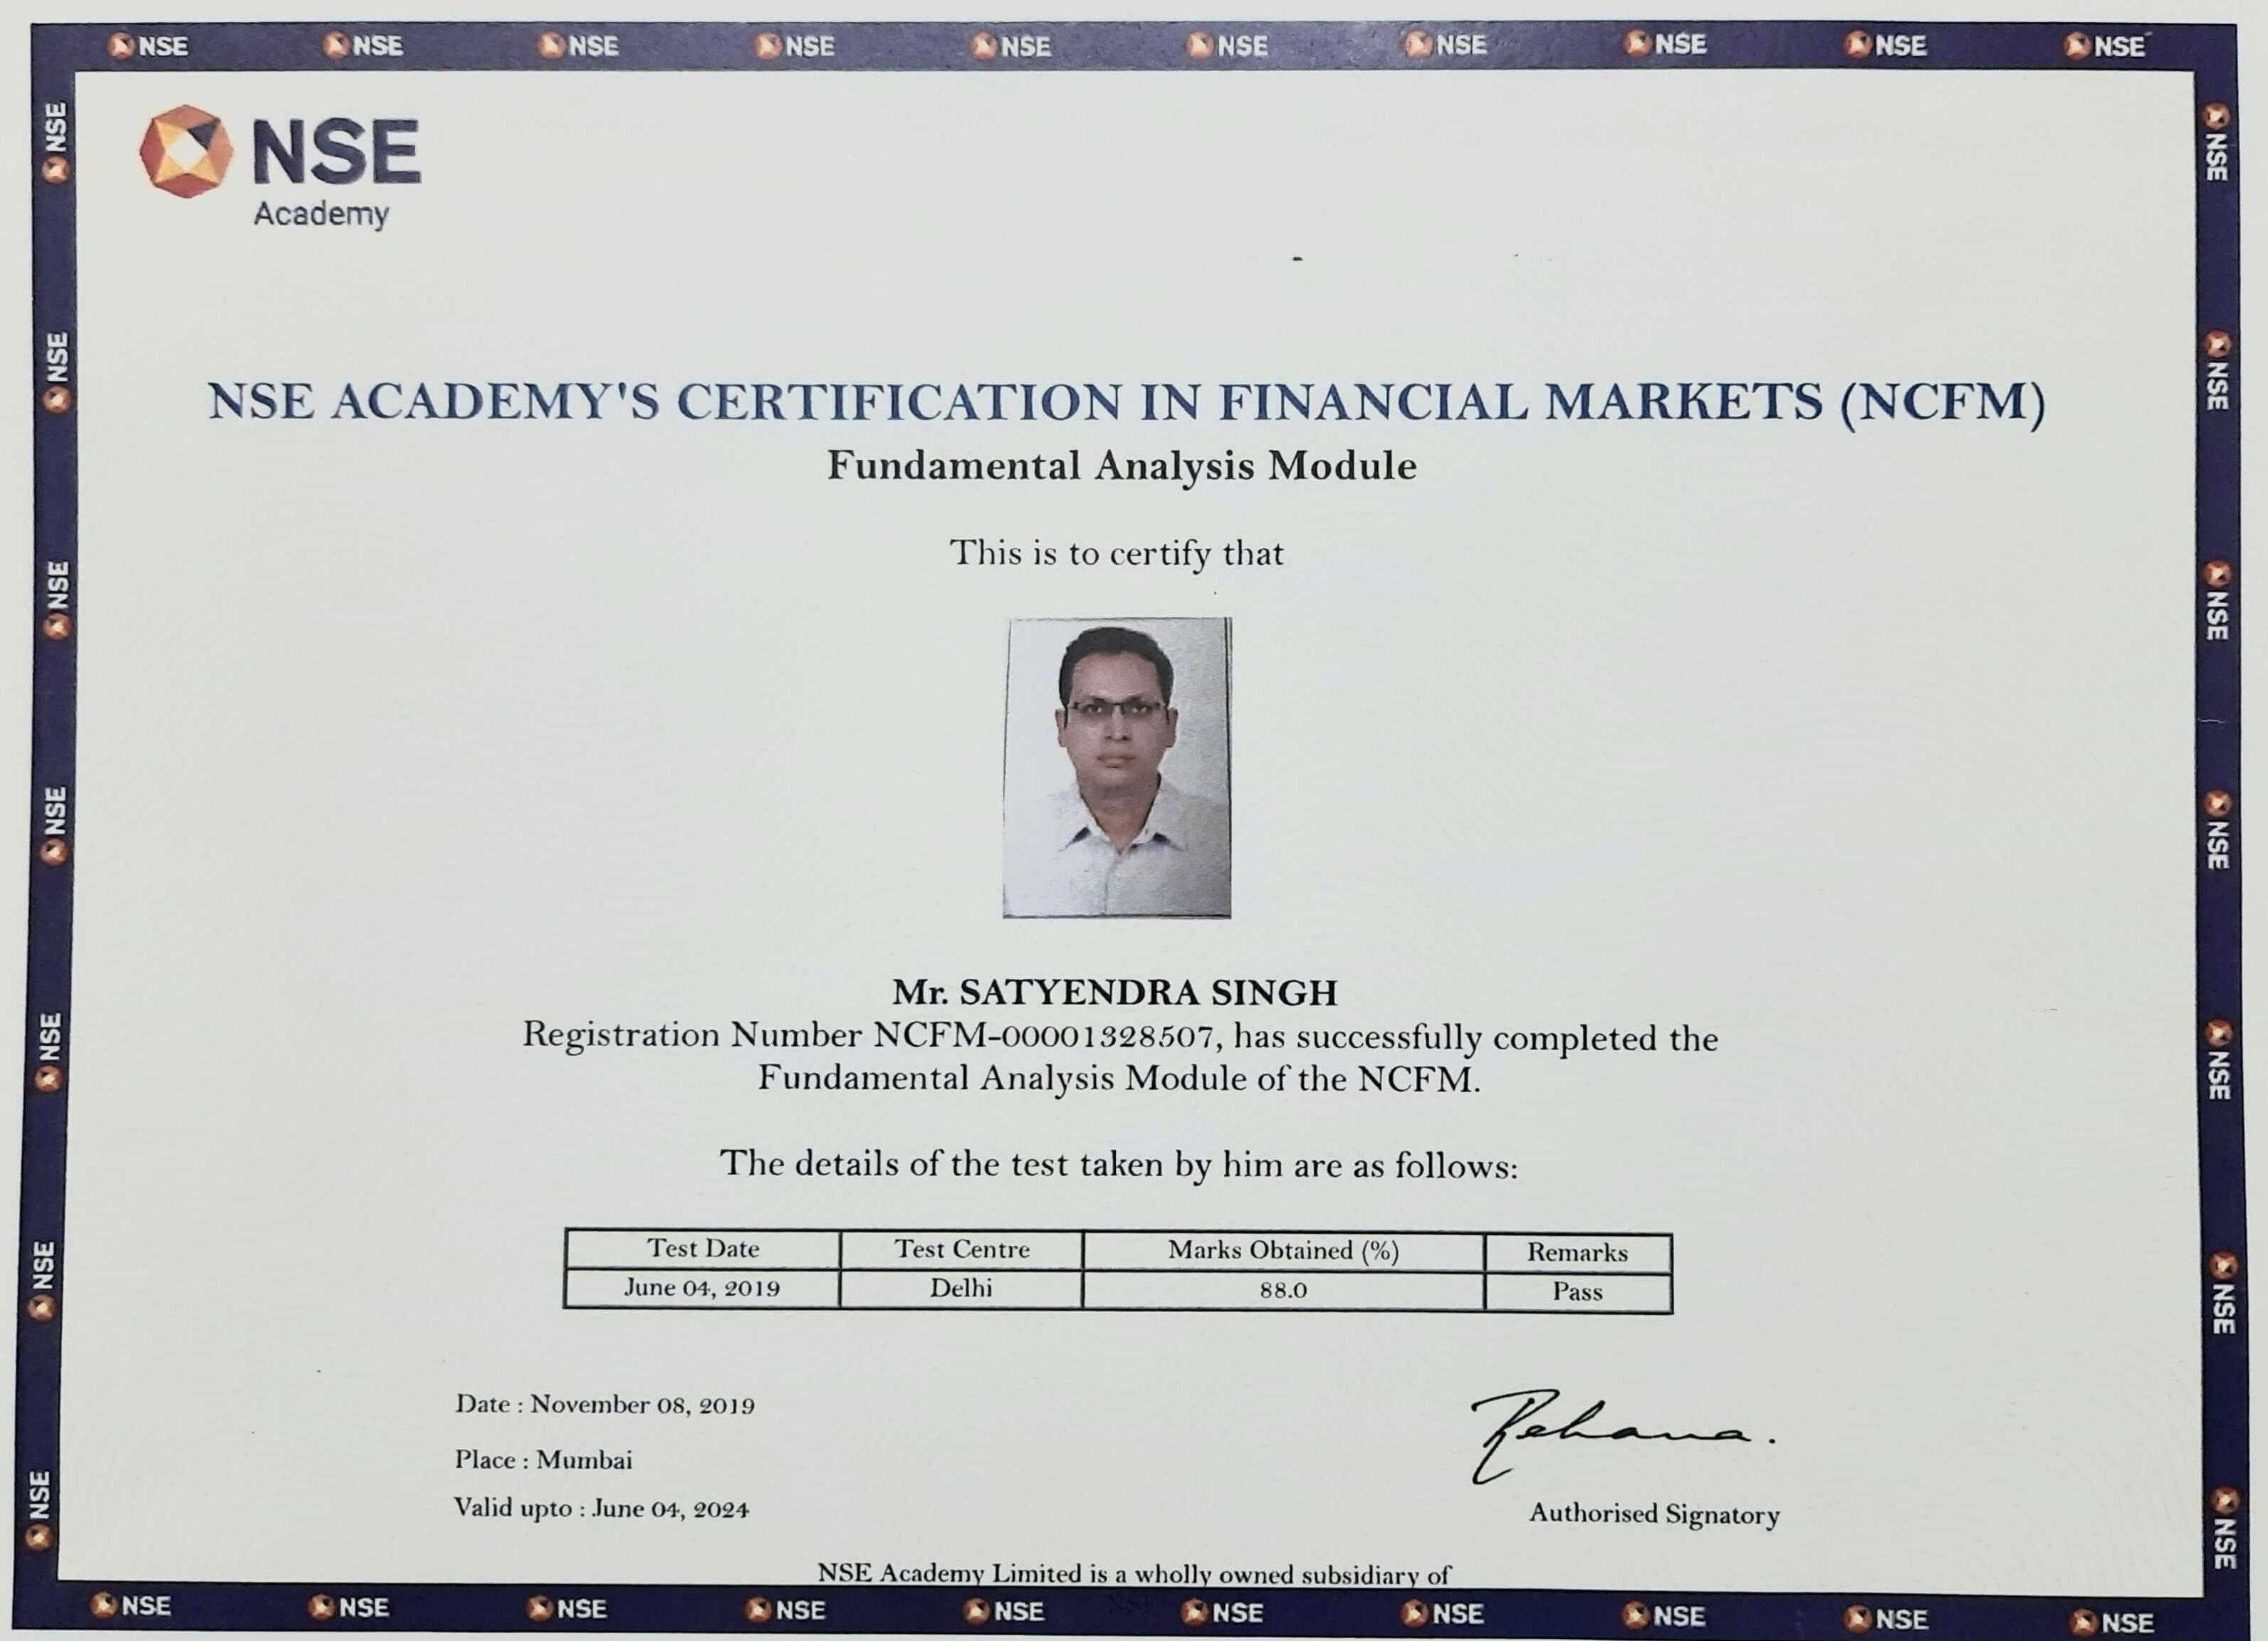 Awarded with NCFM Fundamental Analysis Module